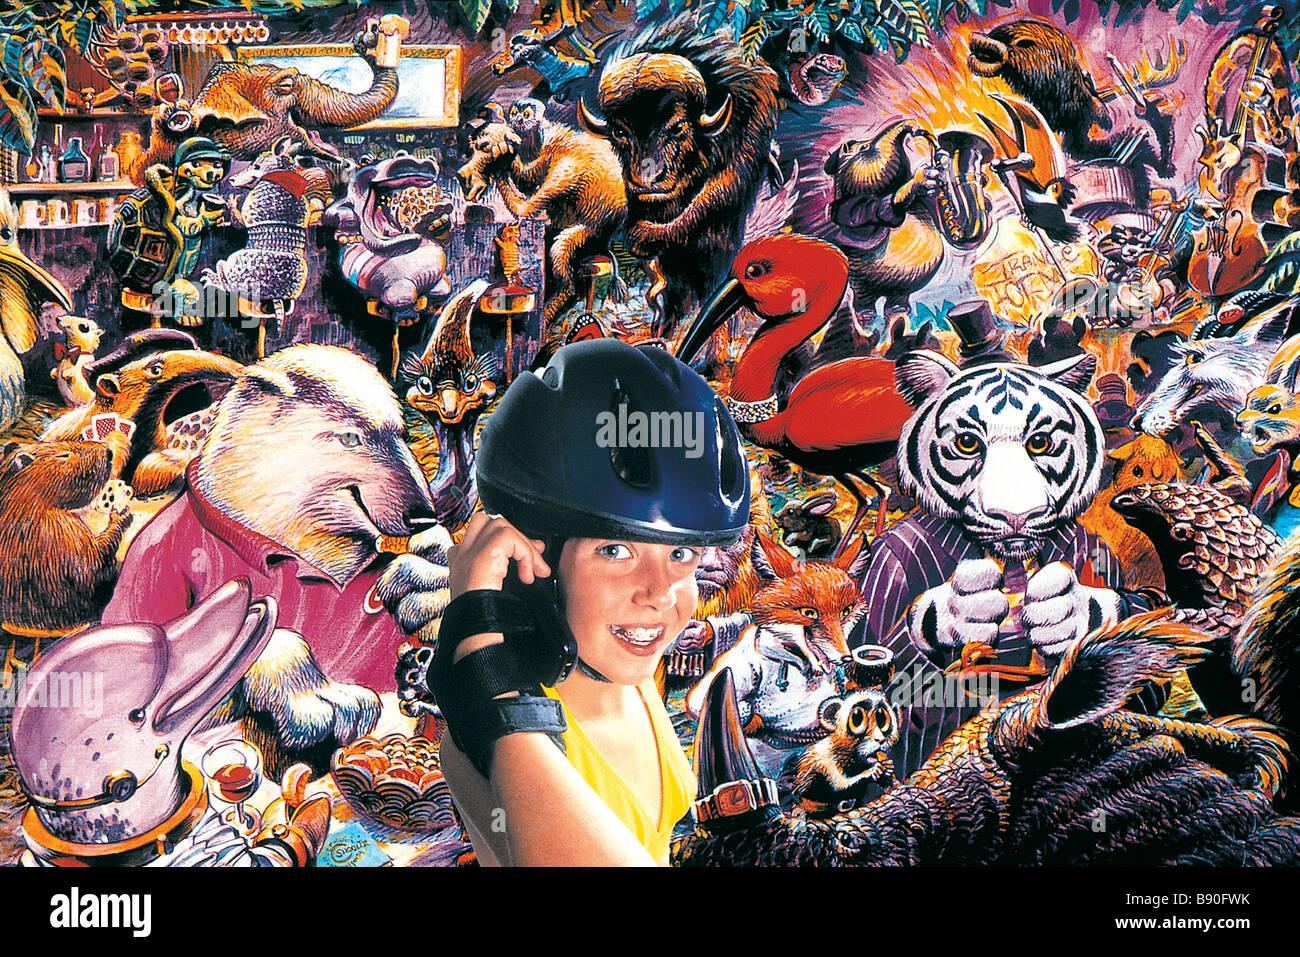 FL2801, BRIAN MILNE; Girl wearing helmet animal collage BG - Stock Image